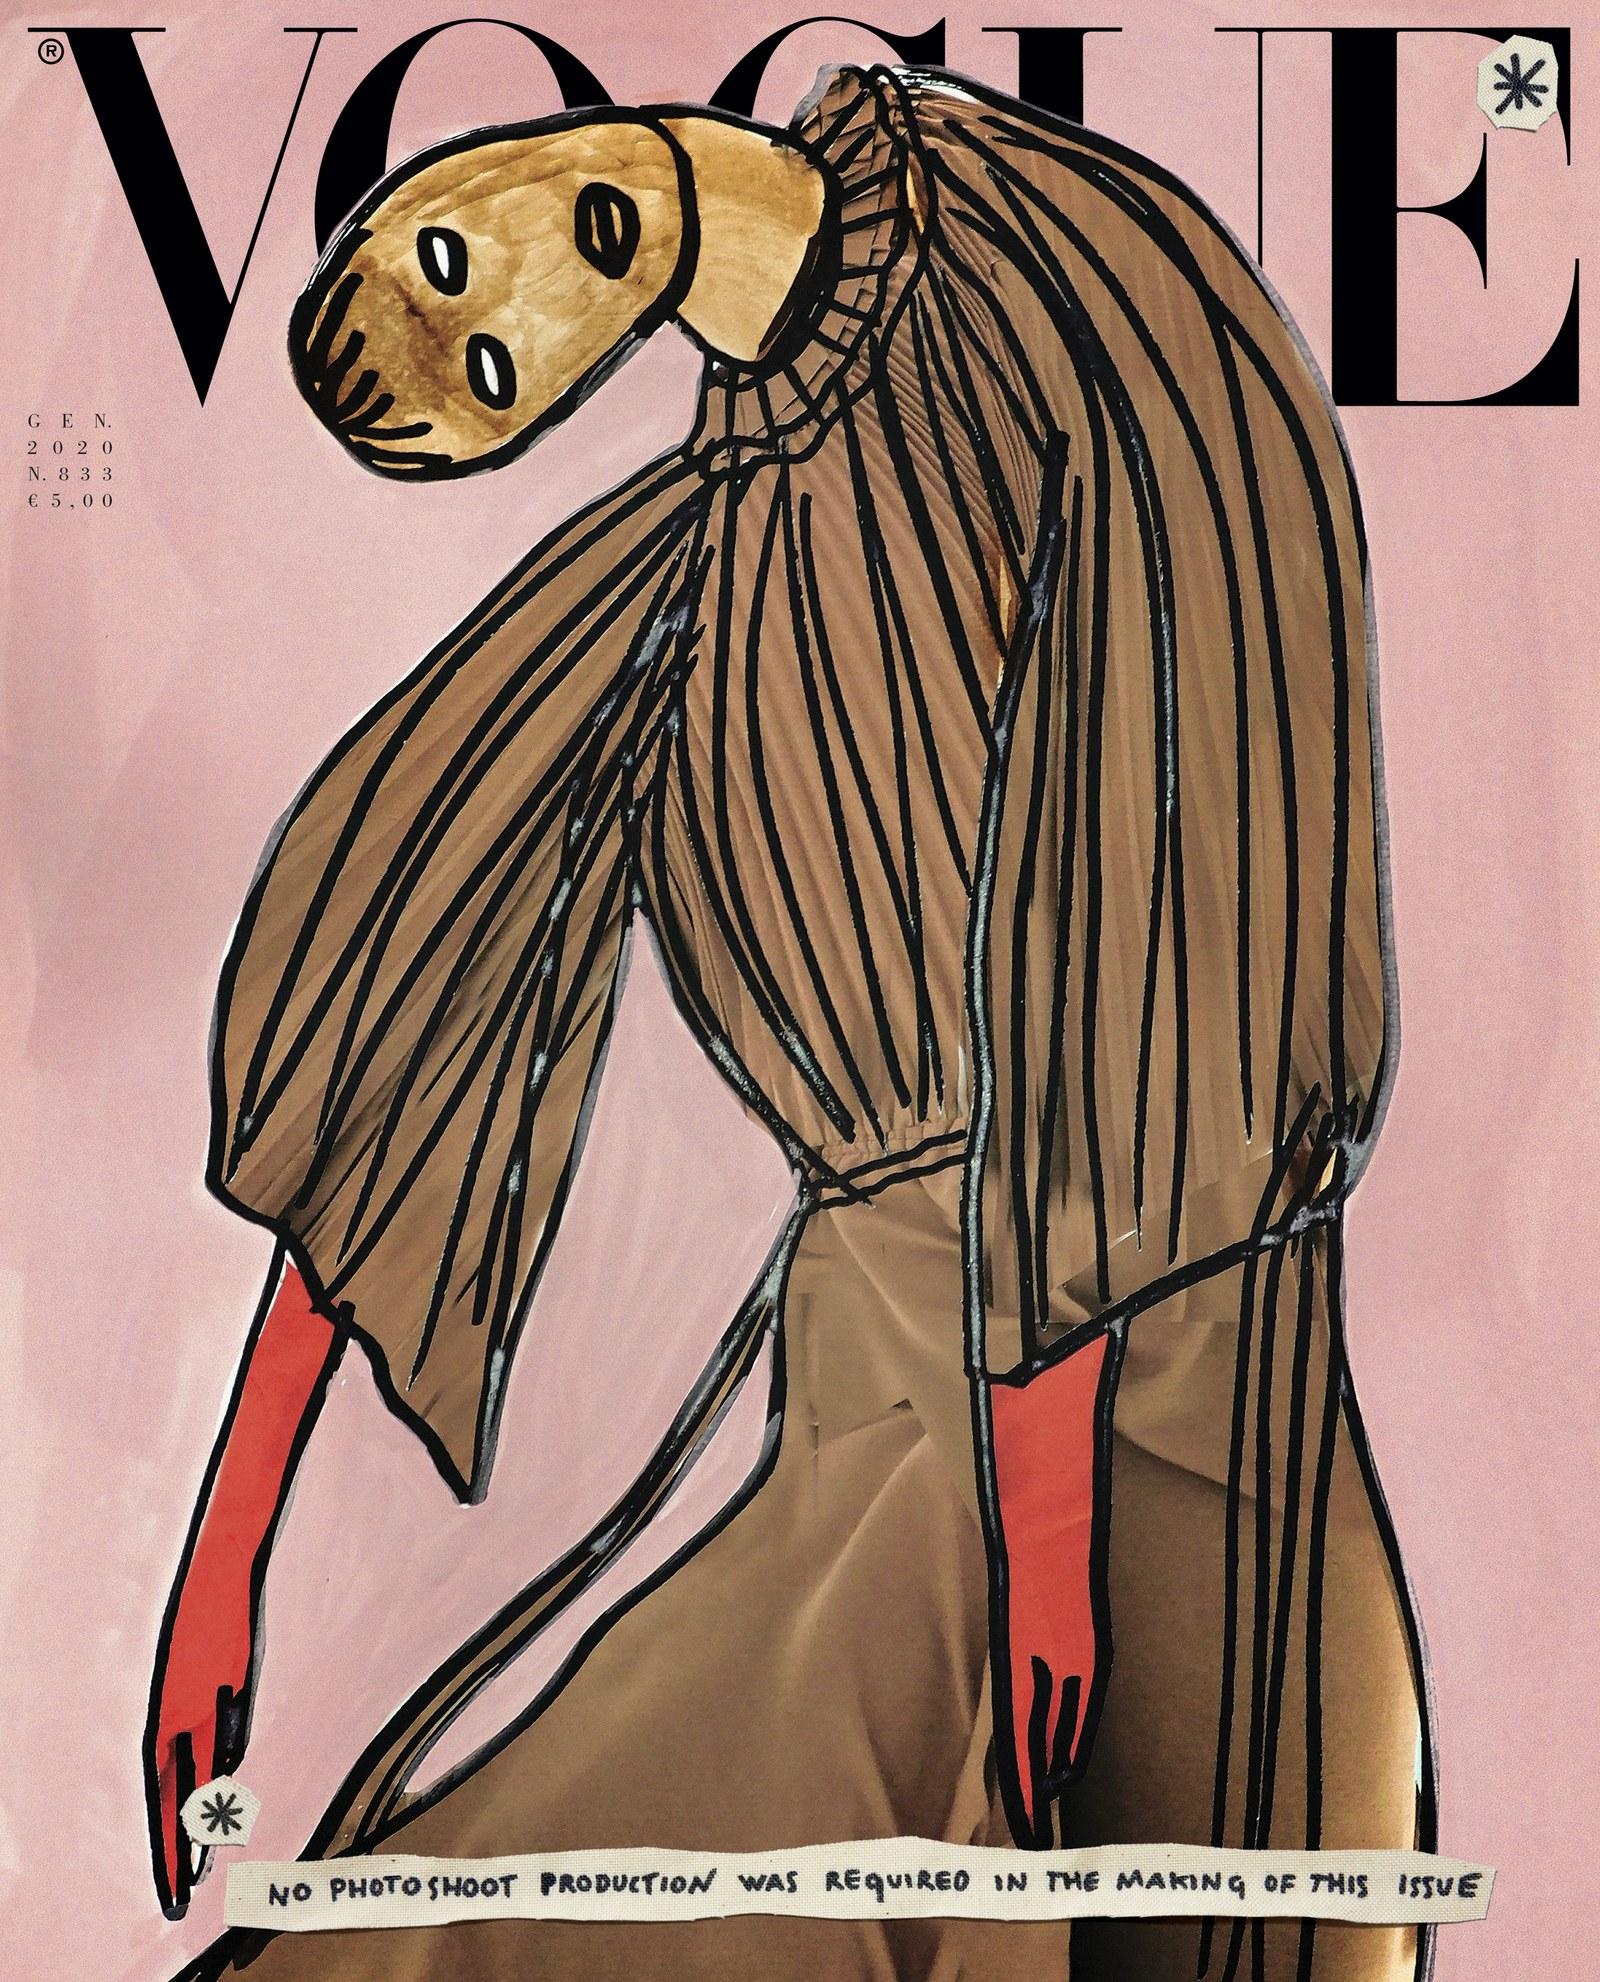 0833_VI_2001_WELL_COVER6_VANESSA_BEECROFT